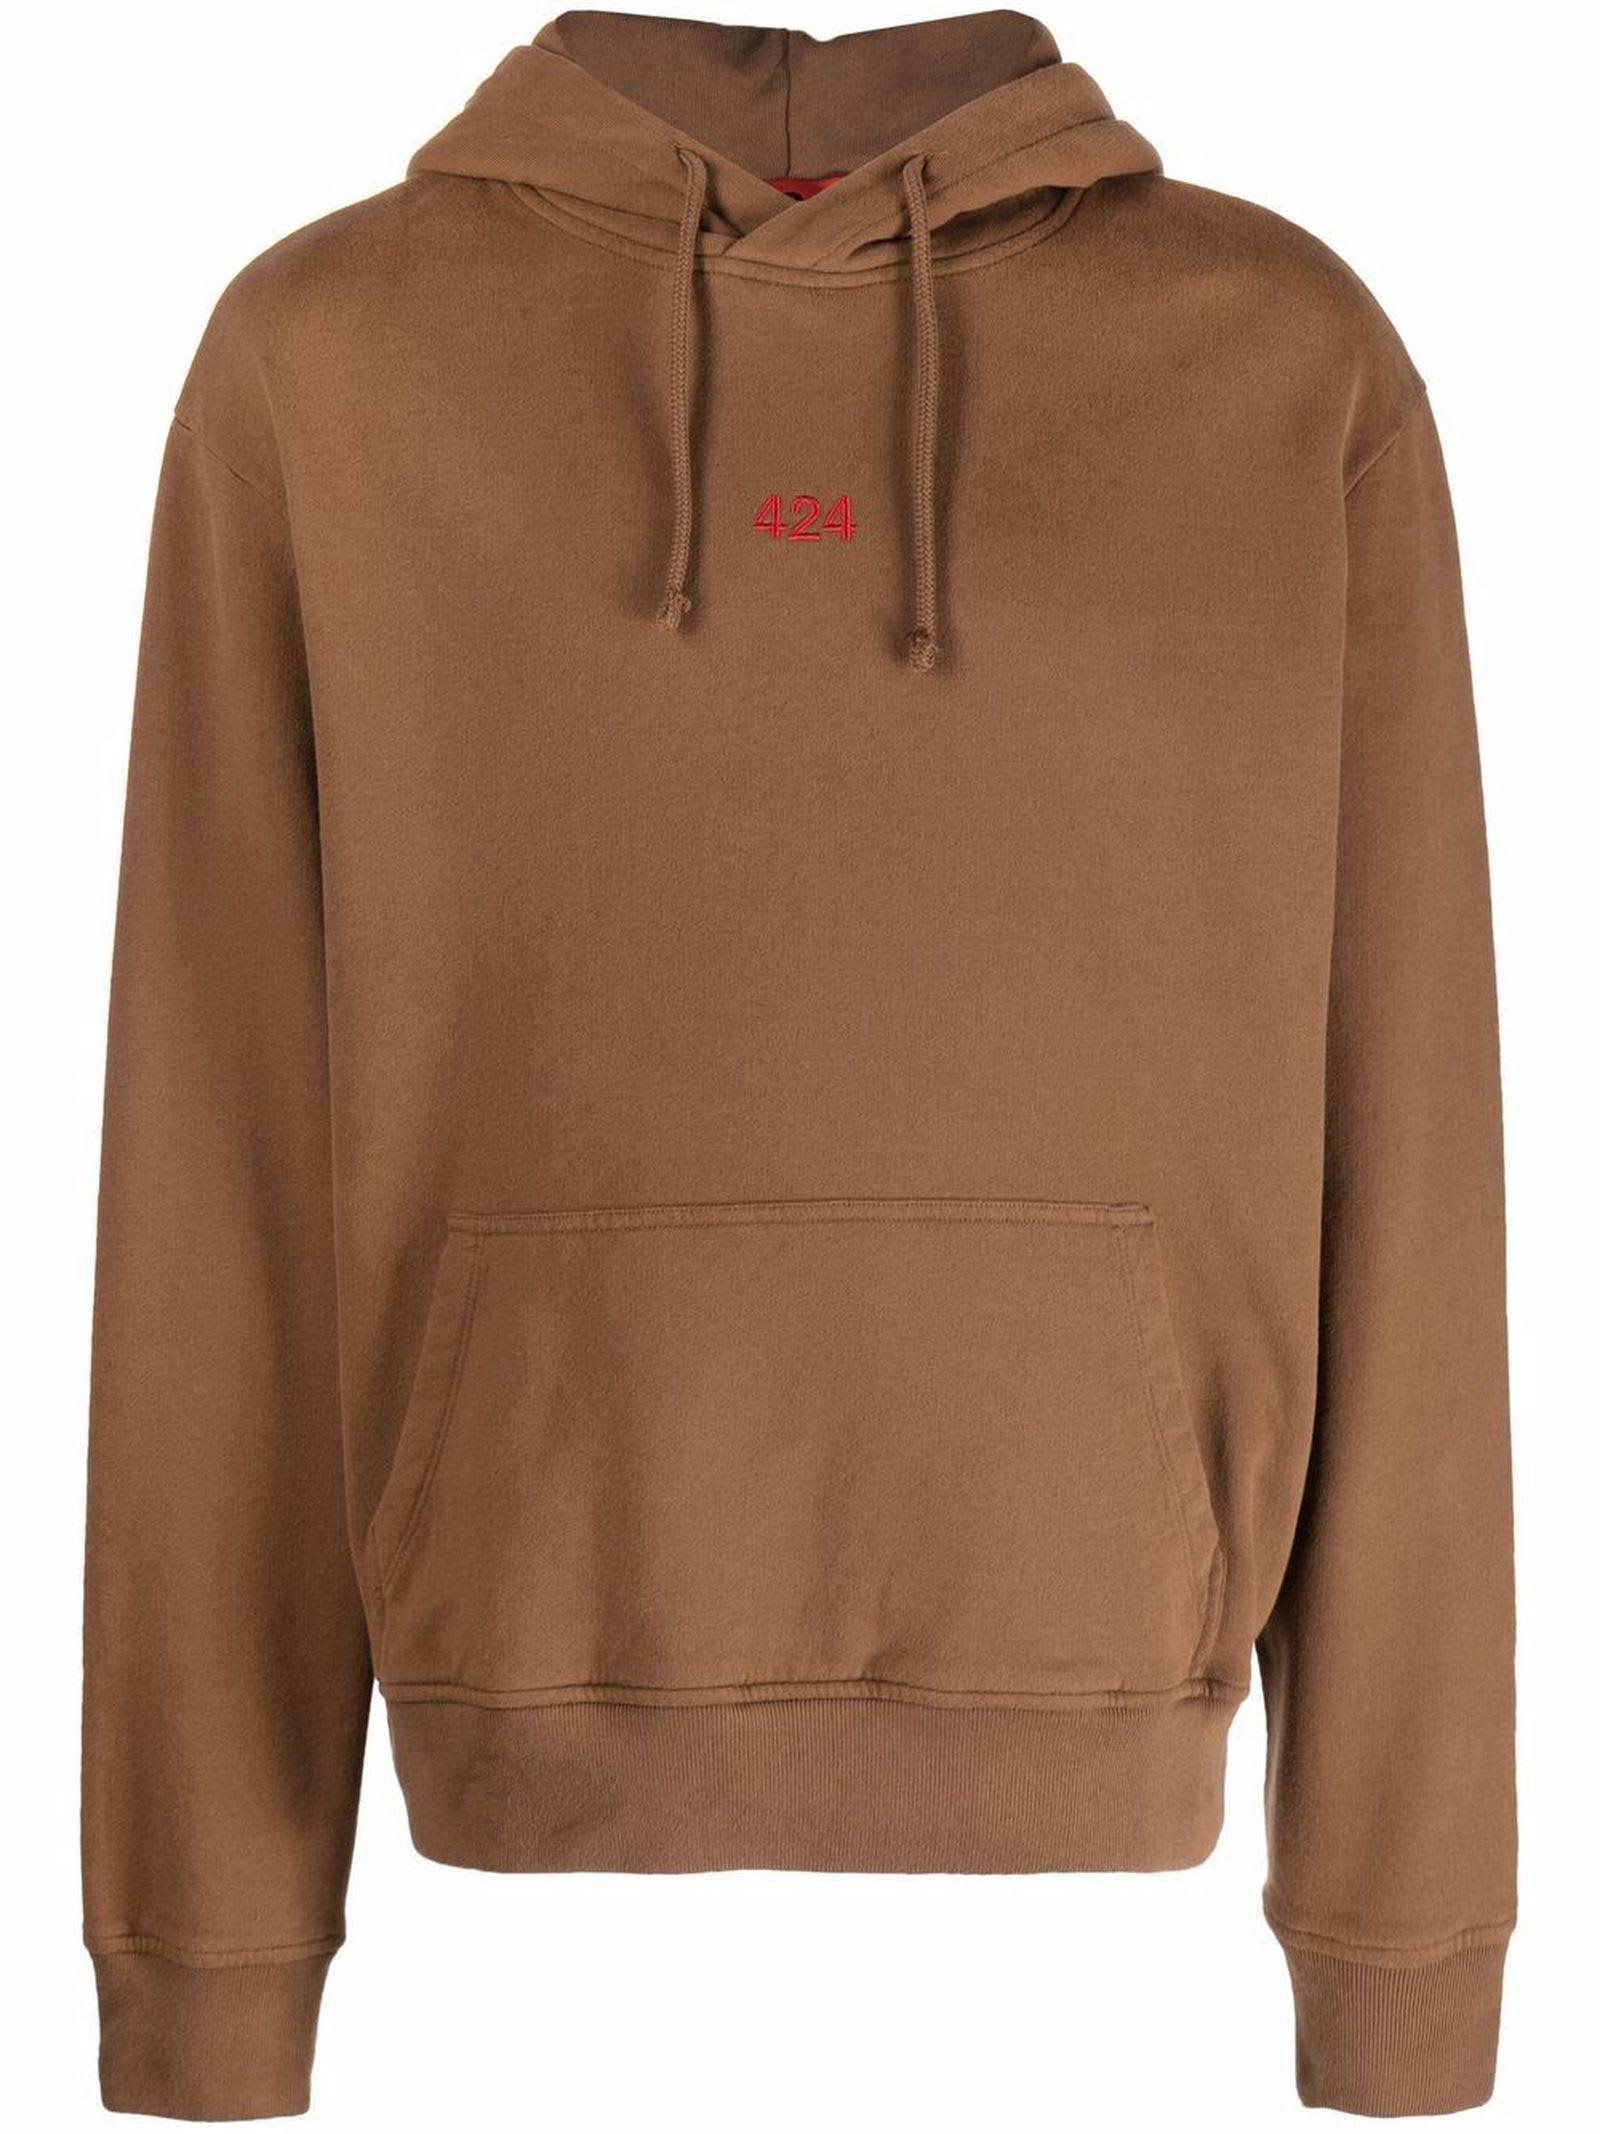 Brown Cotton Hoodie